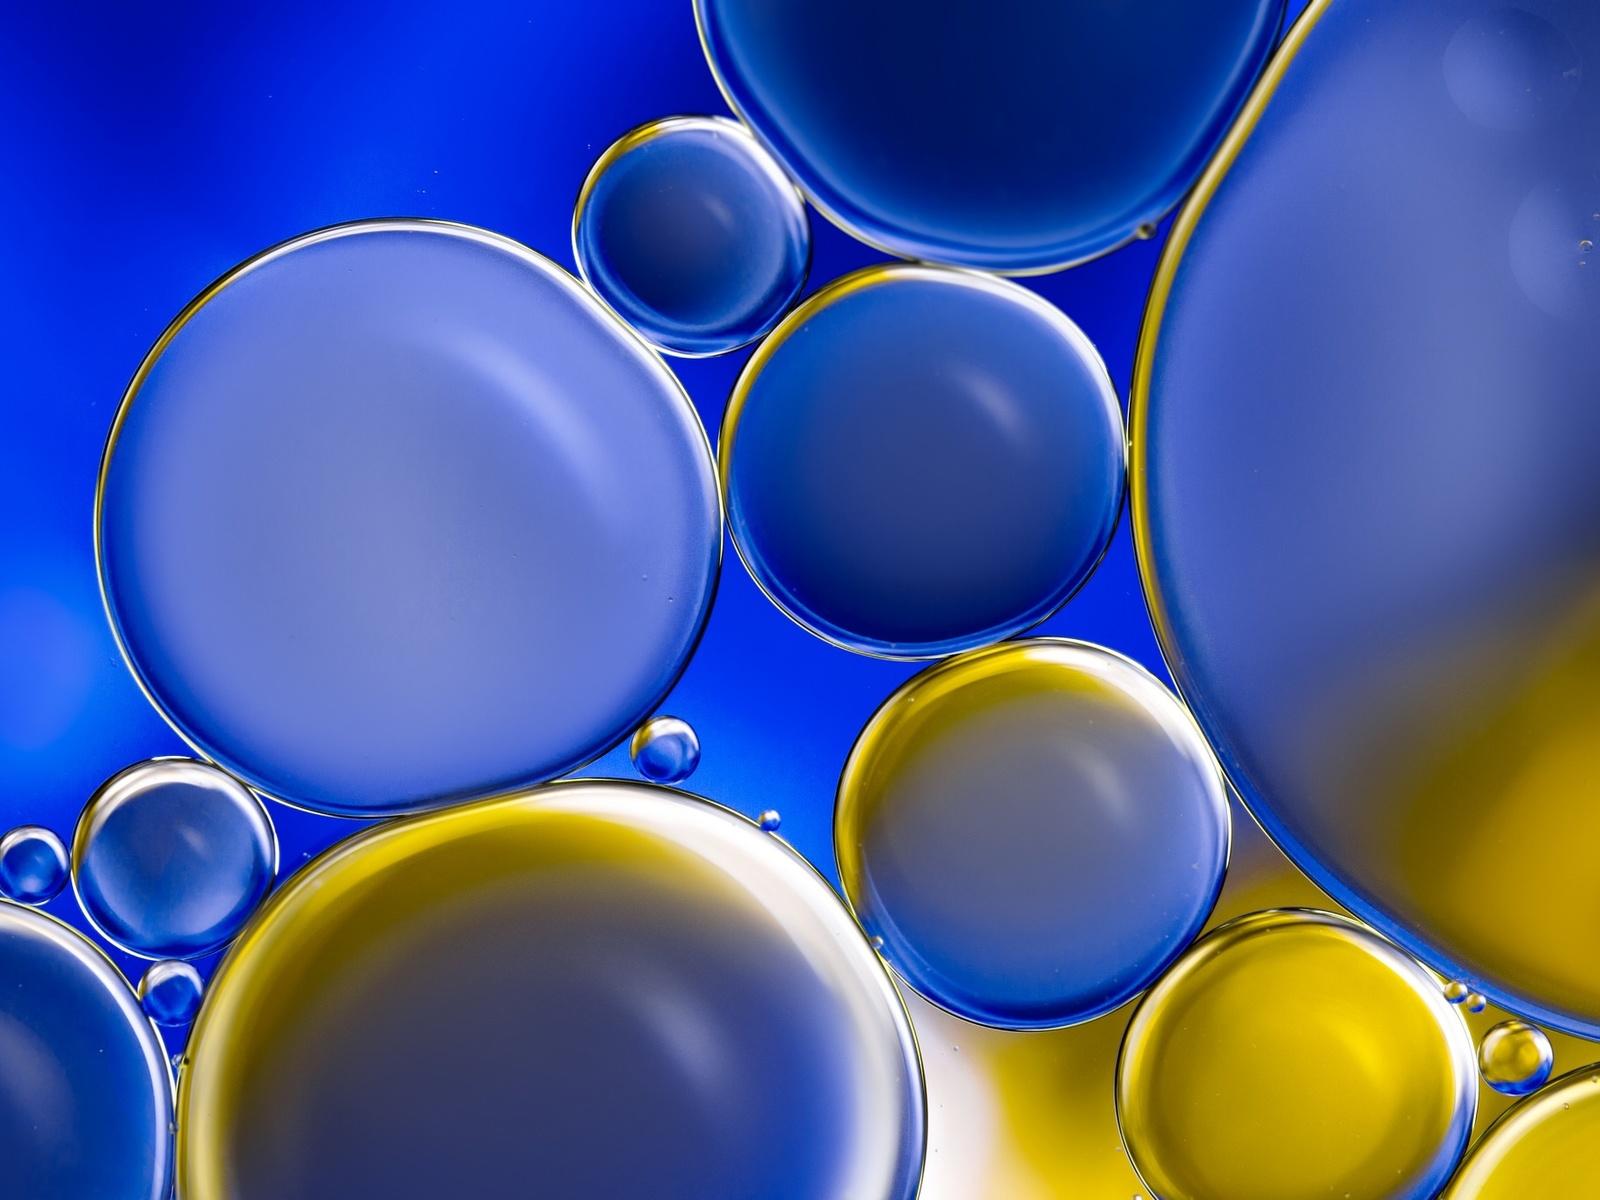 воздух, пузырьки, фон